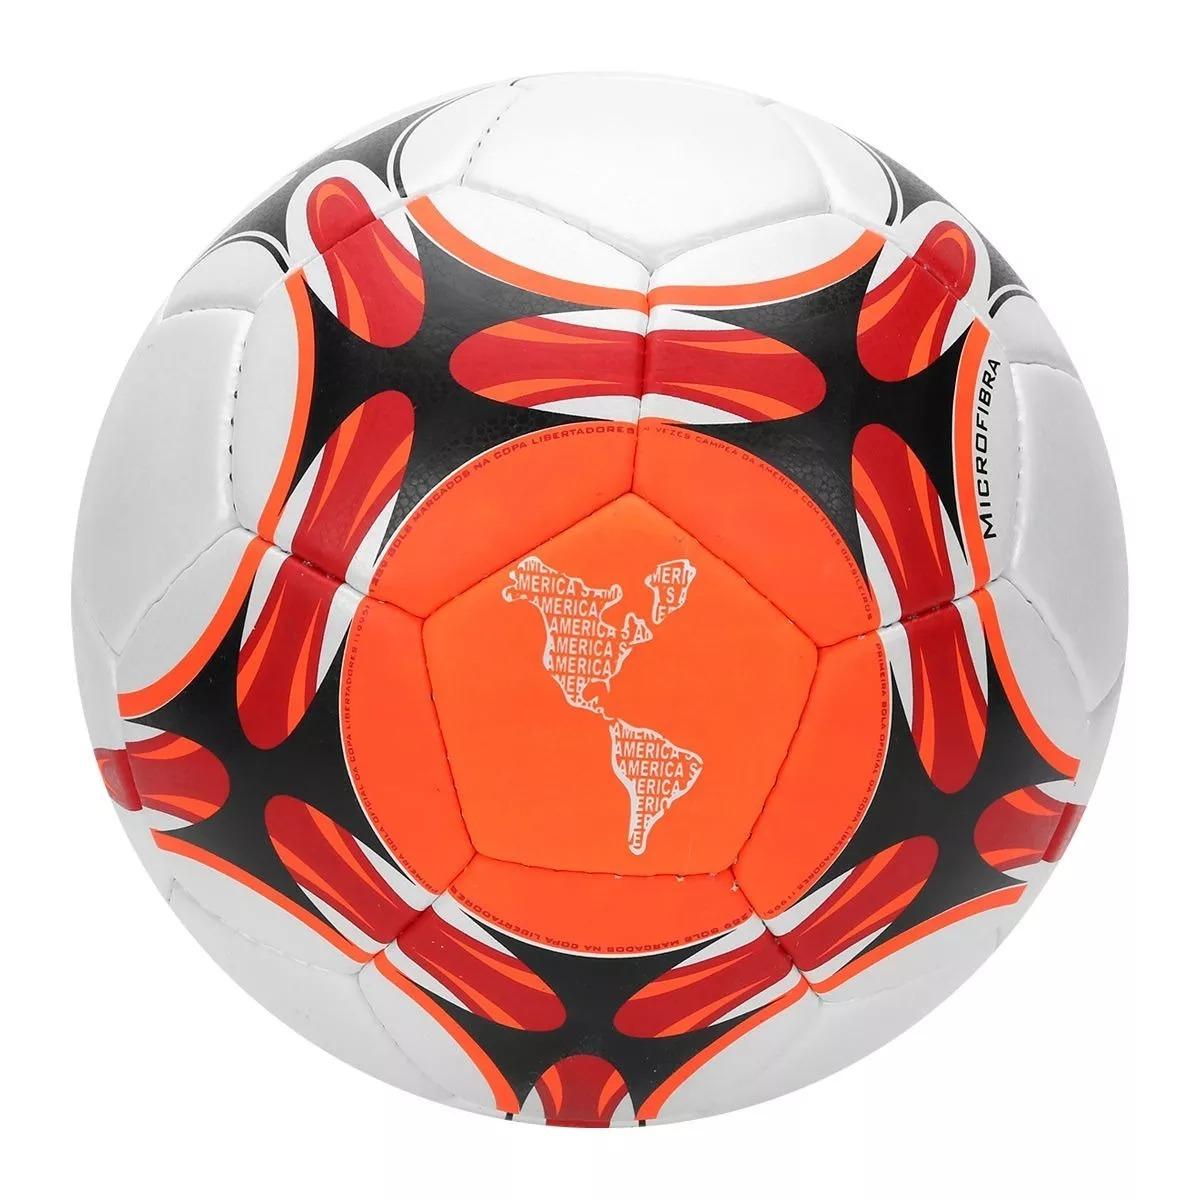 ... campo brasil 70 profissional 1magnus. Carregando zoom... bola penalty  futebol. Carregando zoom. 9ebec51d79b45